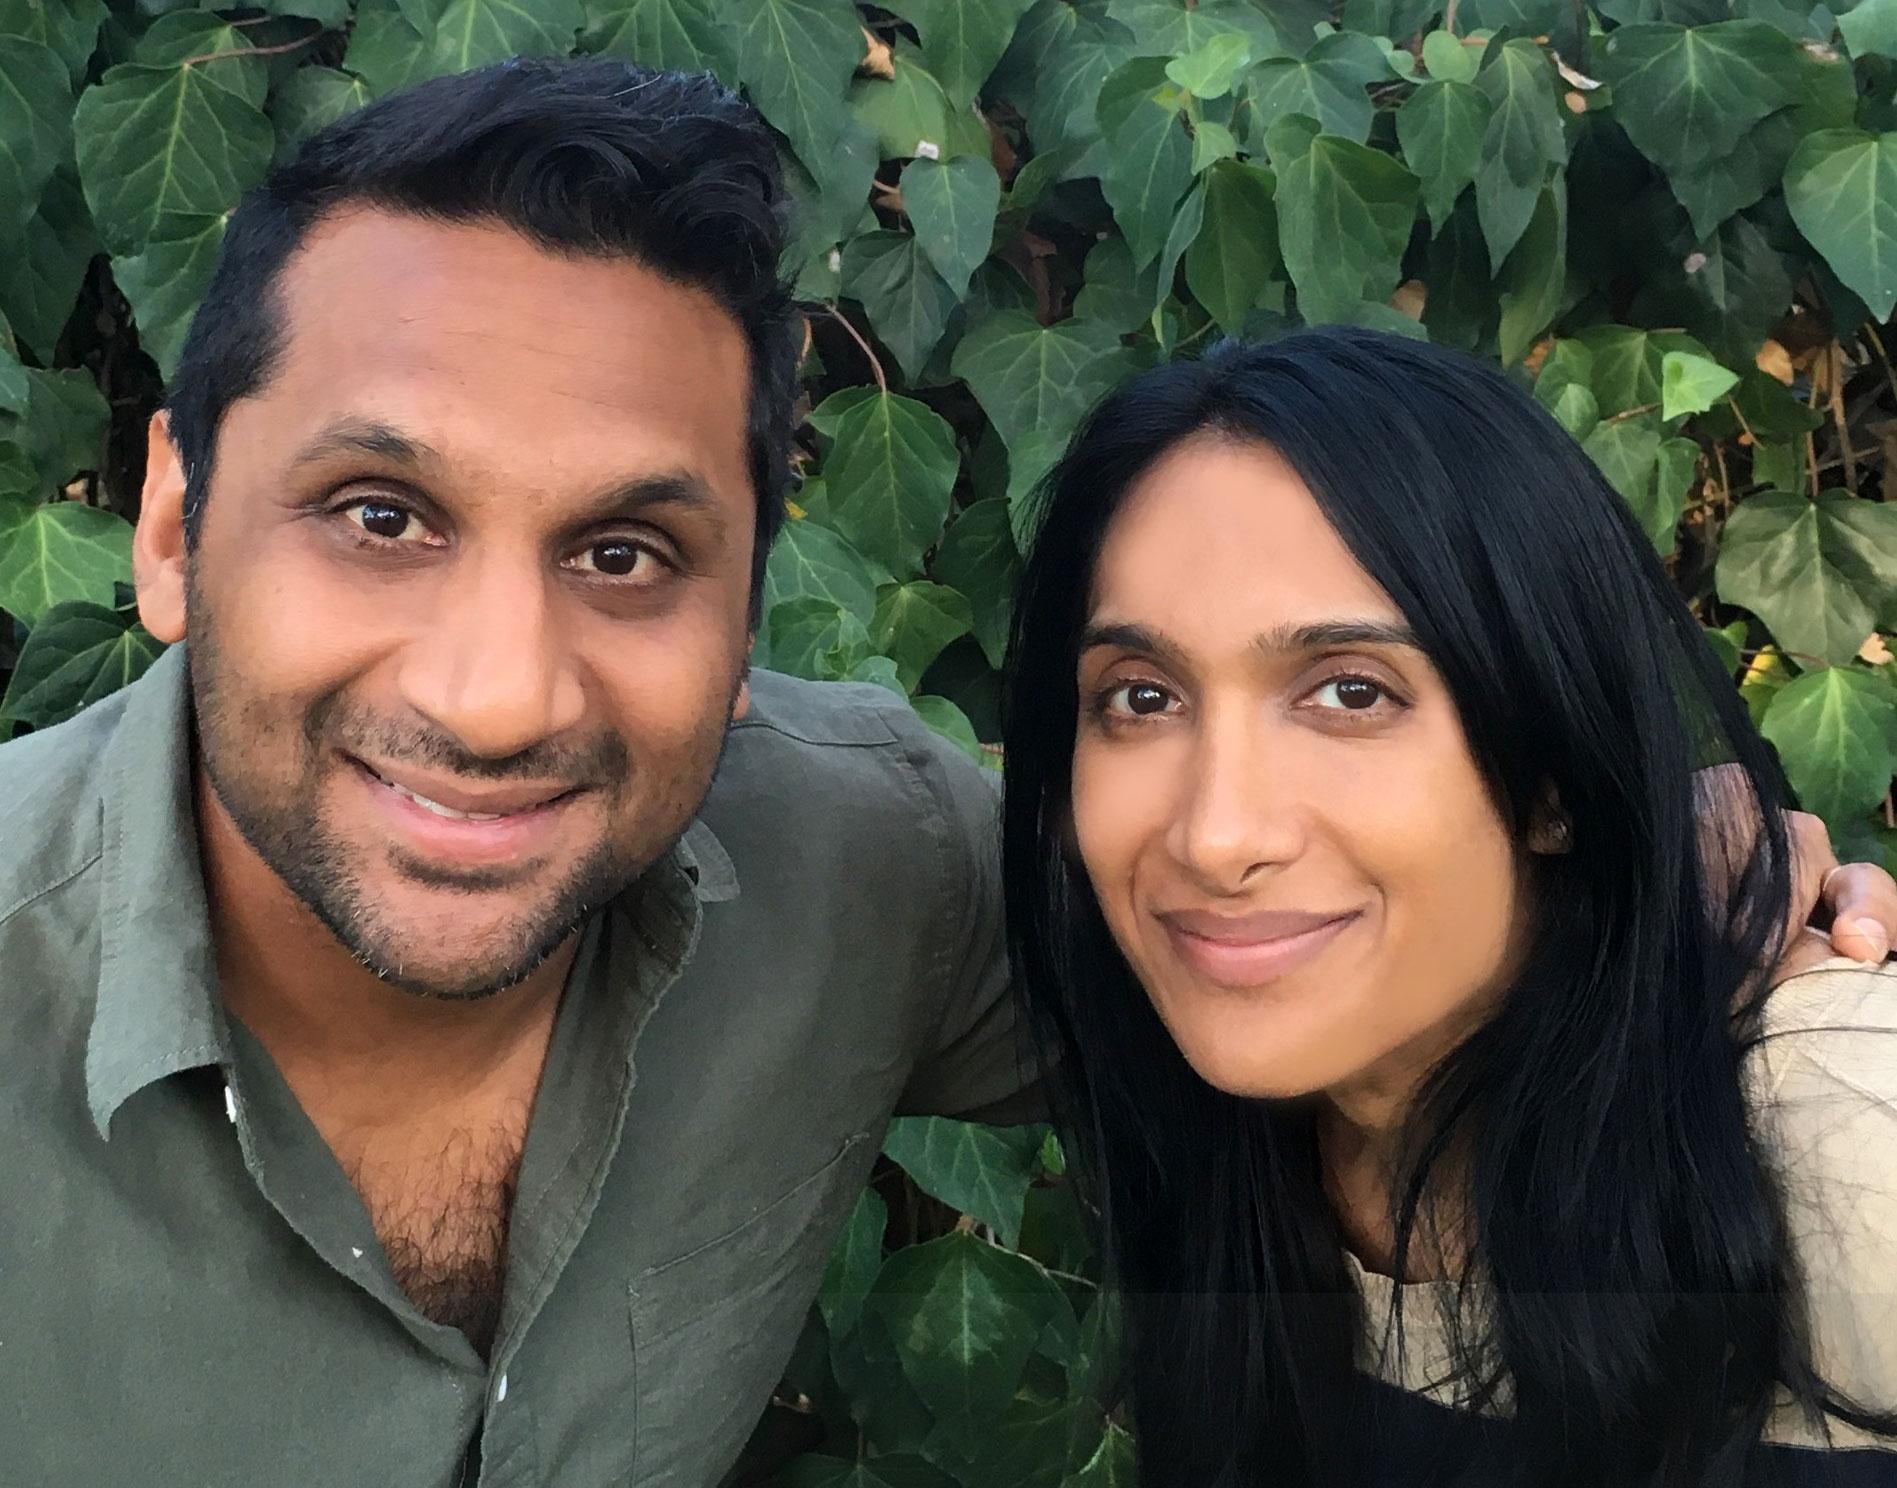 Filmmaker siblings Ravi and Geeta Patel of Meet the Patels